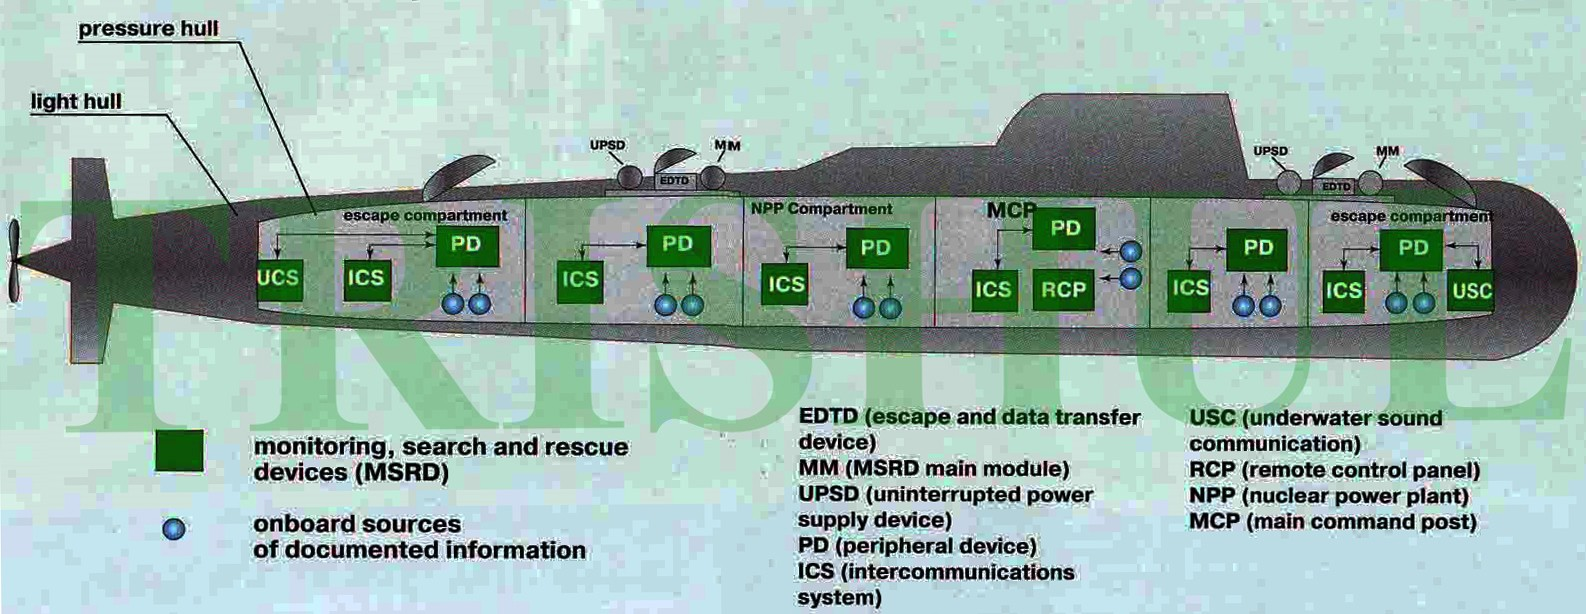 Data Recording Systems Using MIL-STD-1553B Digibus.JPG